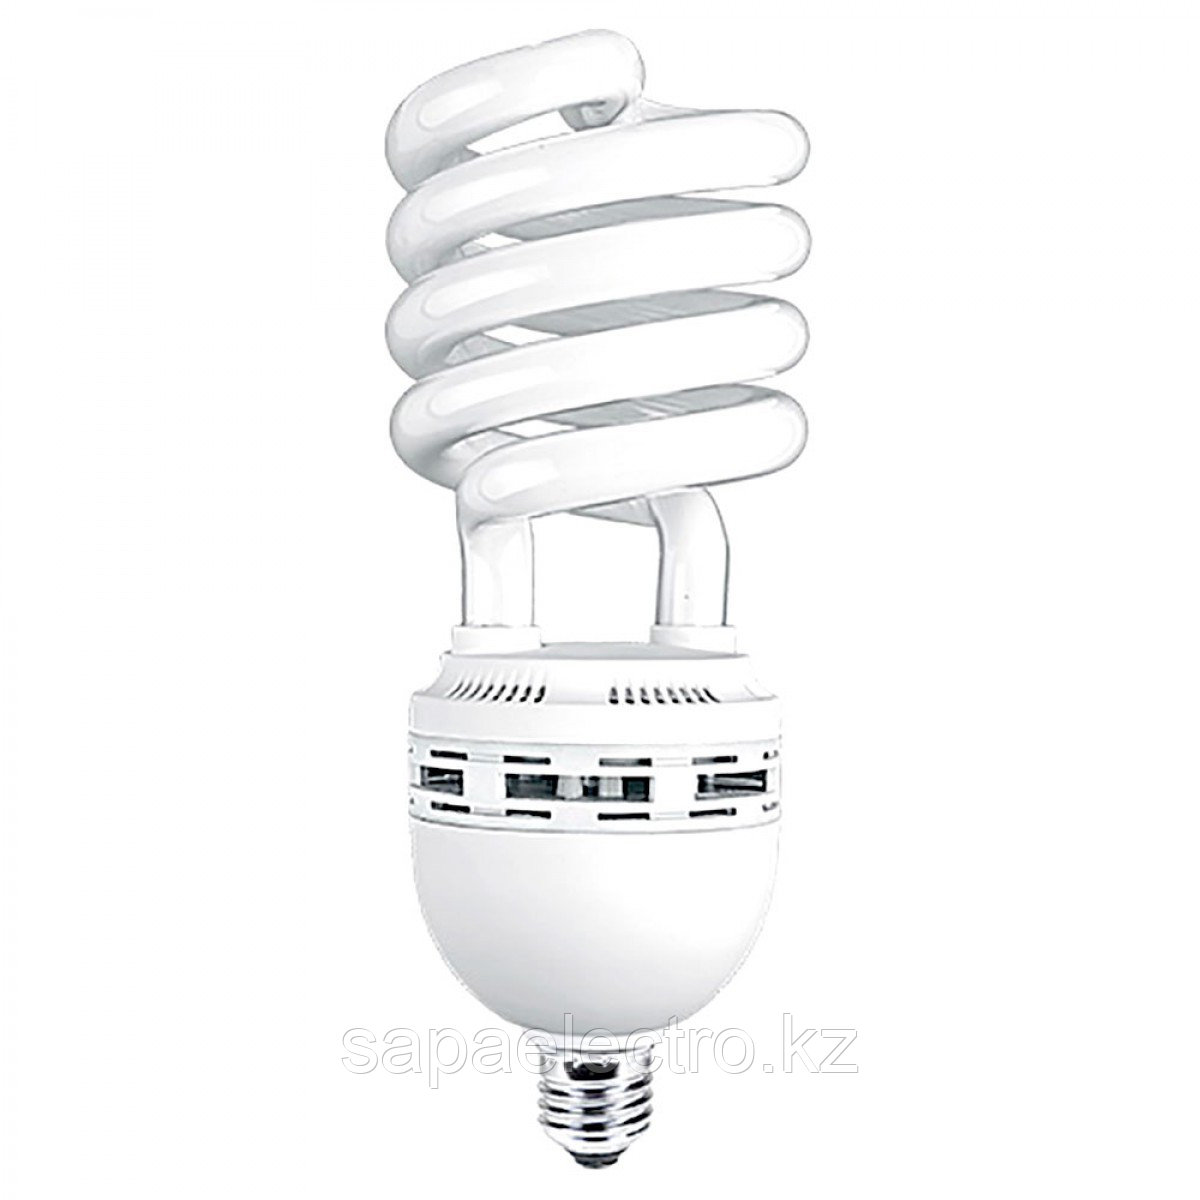 Лампа SPIRAL   70W   860K   E27 (TECHNOLIGHT) 20шт